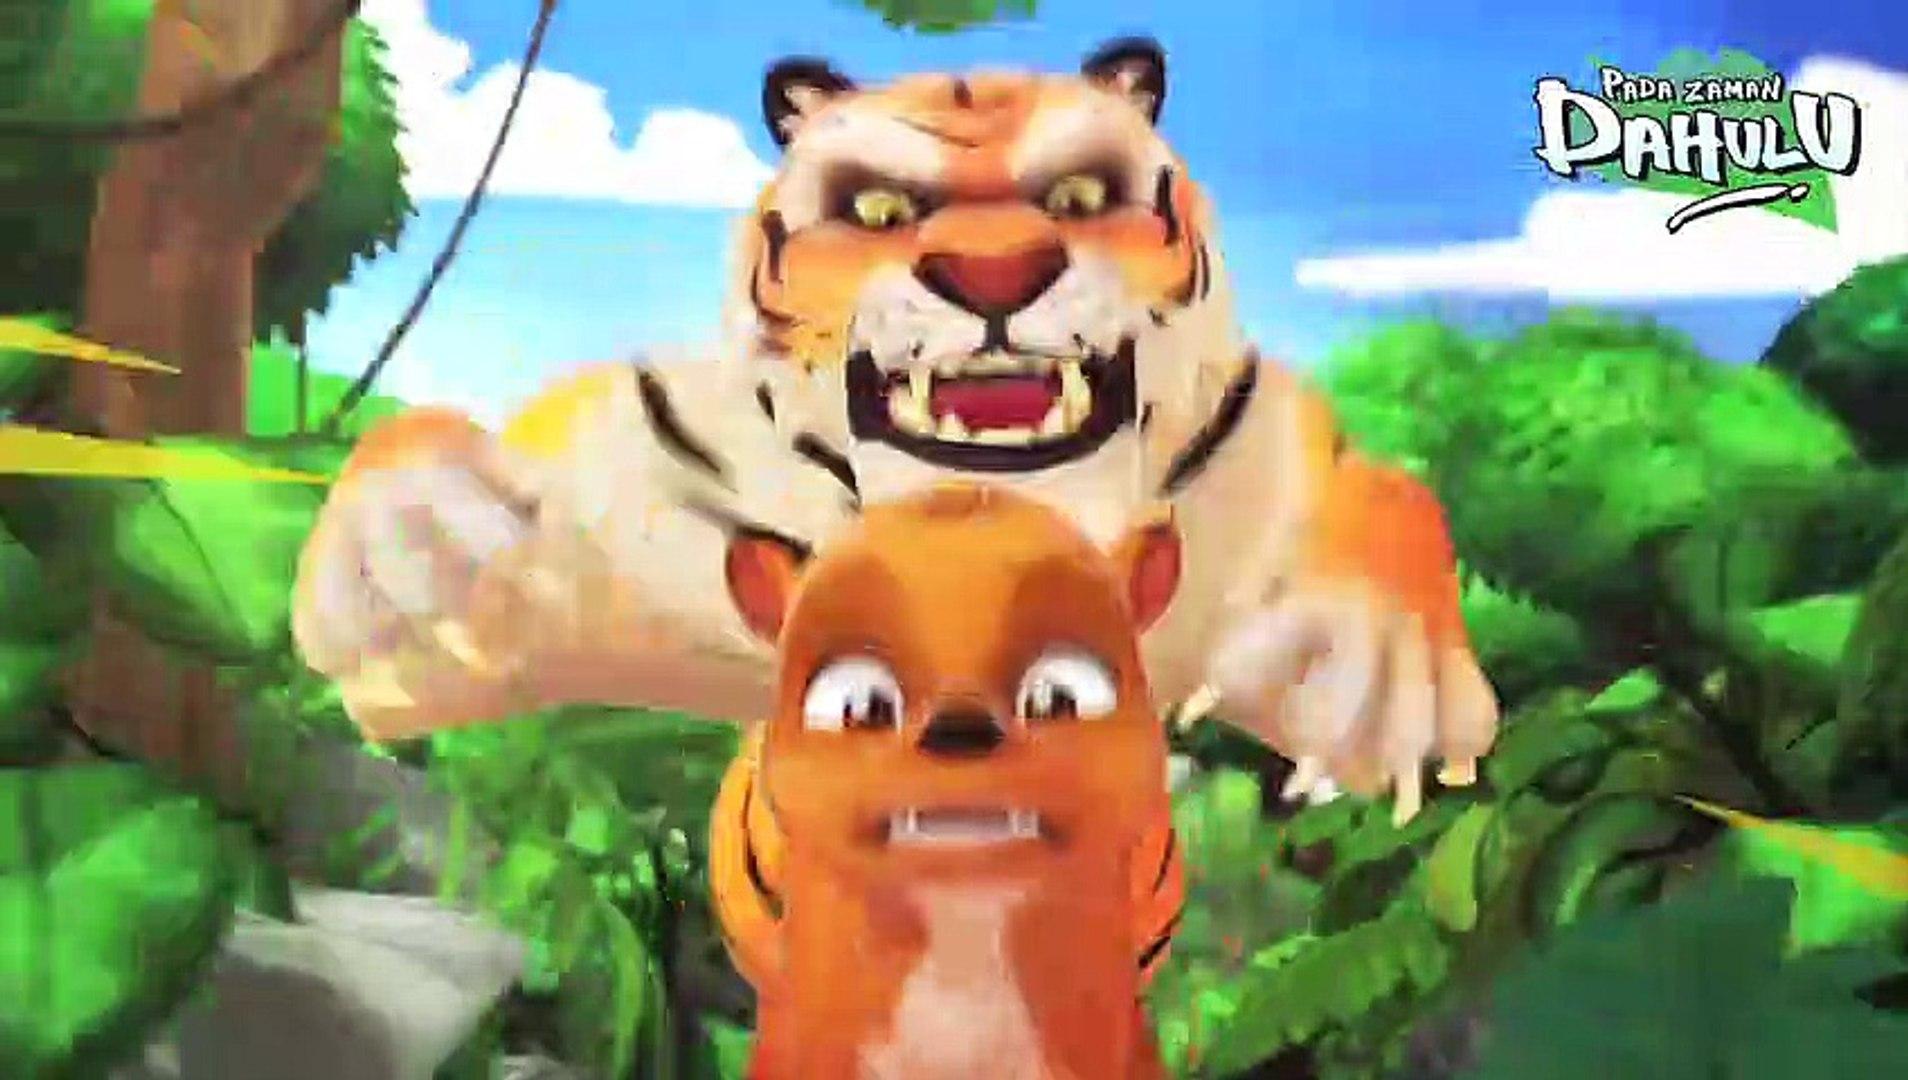 Cerita Aki Penghuni Hutan Harimau Terbaru Film Kartun Anak Anak Tv Hd 2019 Cinema Comedy Action Dailymotion Video